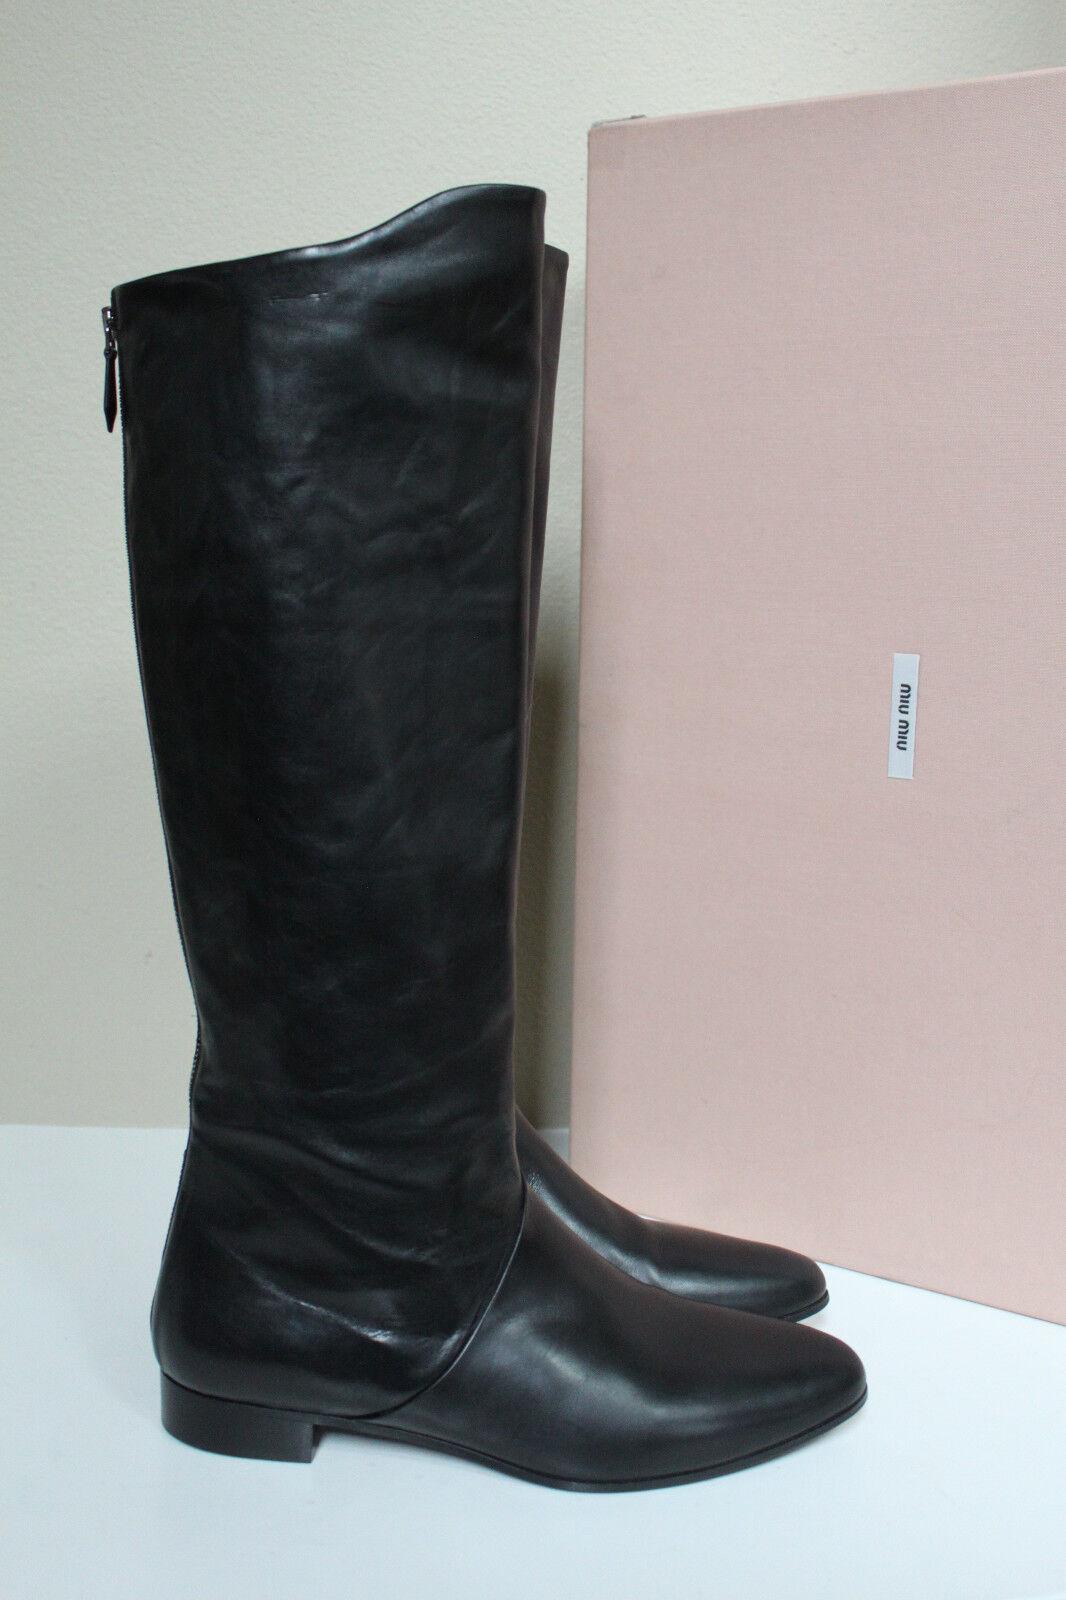 New sz 5.5 / 35.5 Miu Miu Pointed Toe Black Leather Knee High Low Heel Boot Shoe